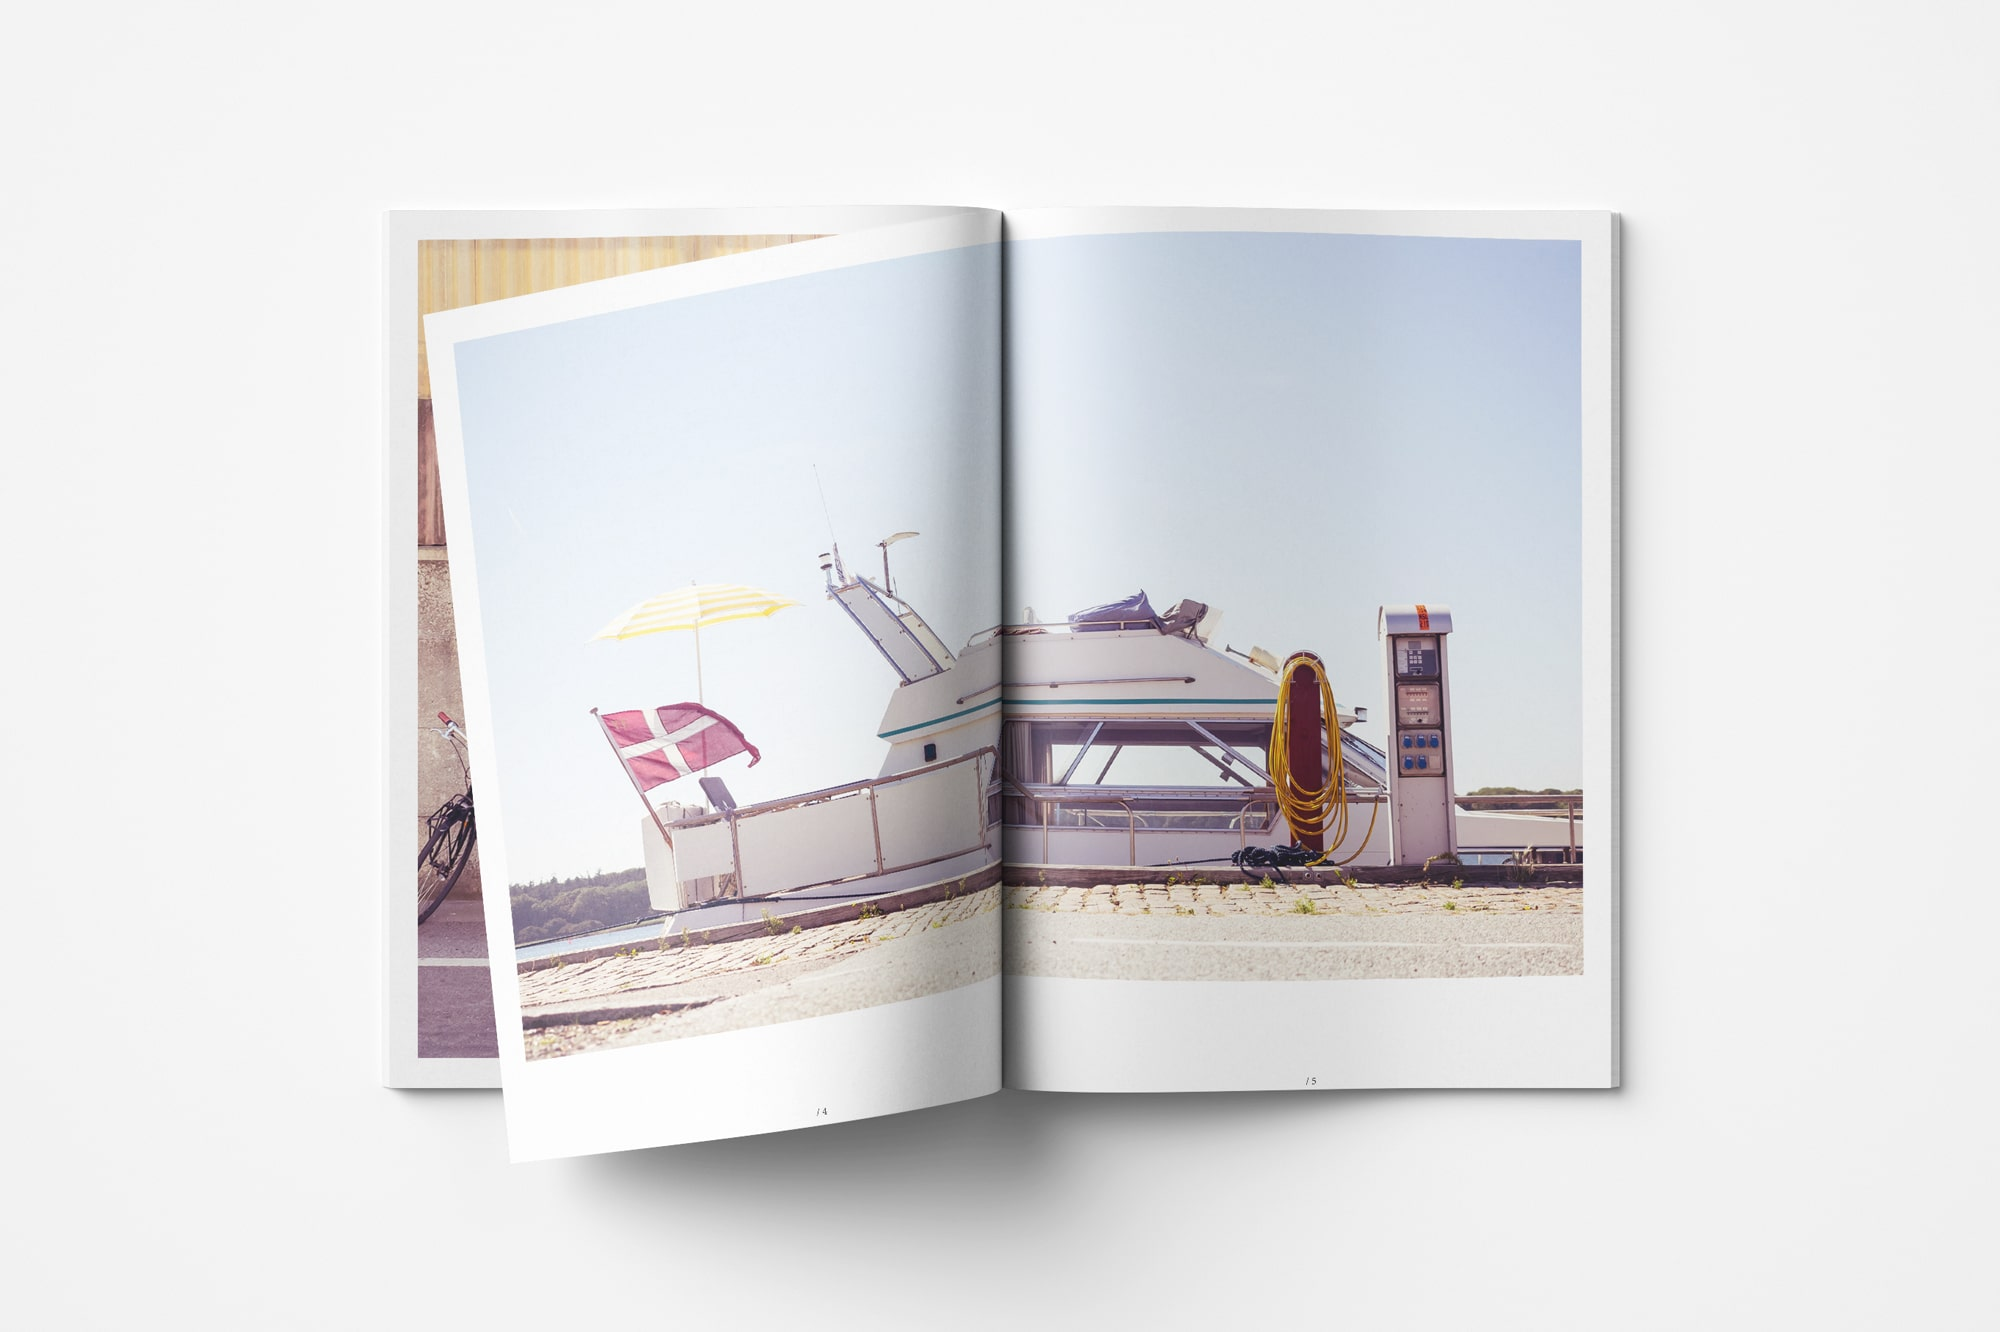 planx-OnLocation-Magazin-01